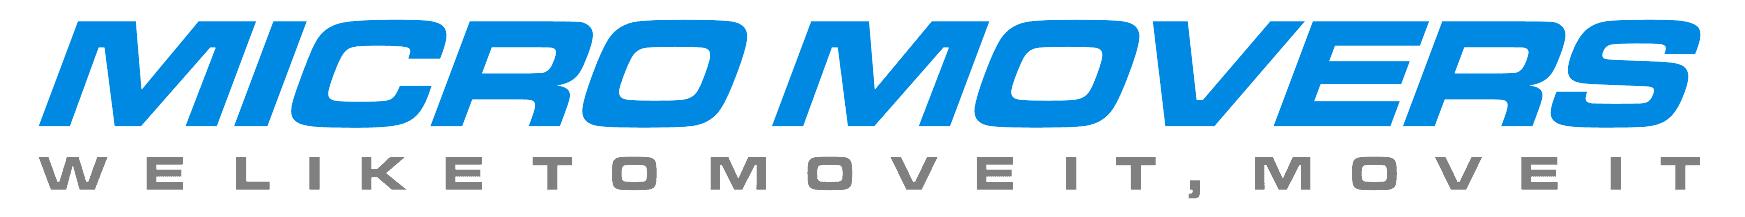 micro movers idaho, llc